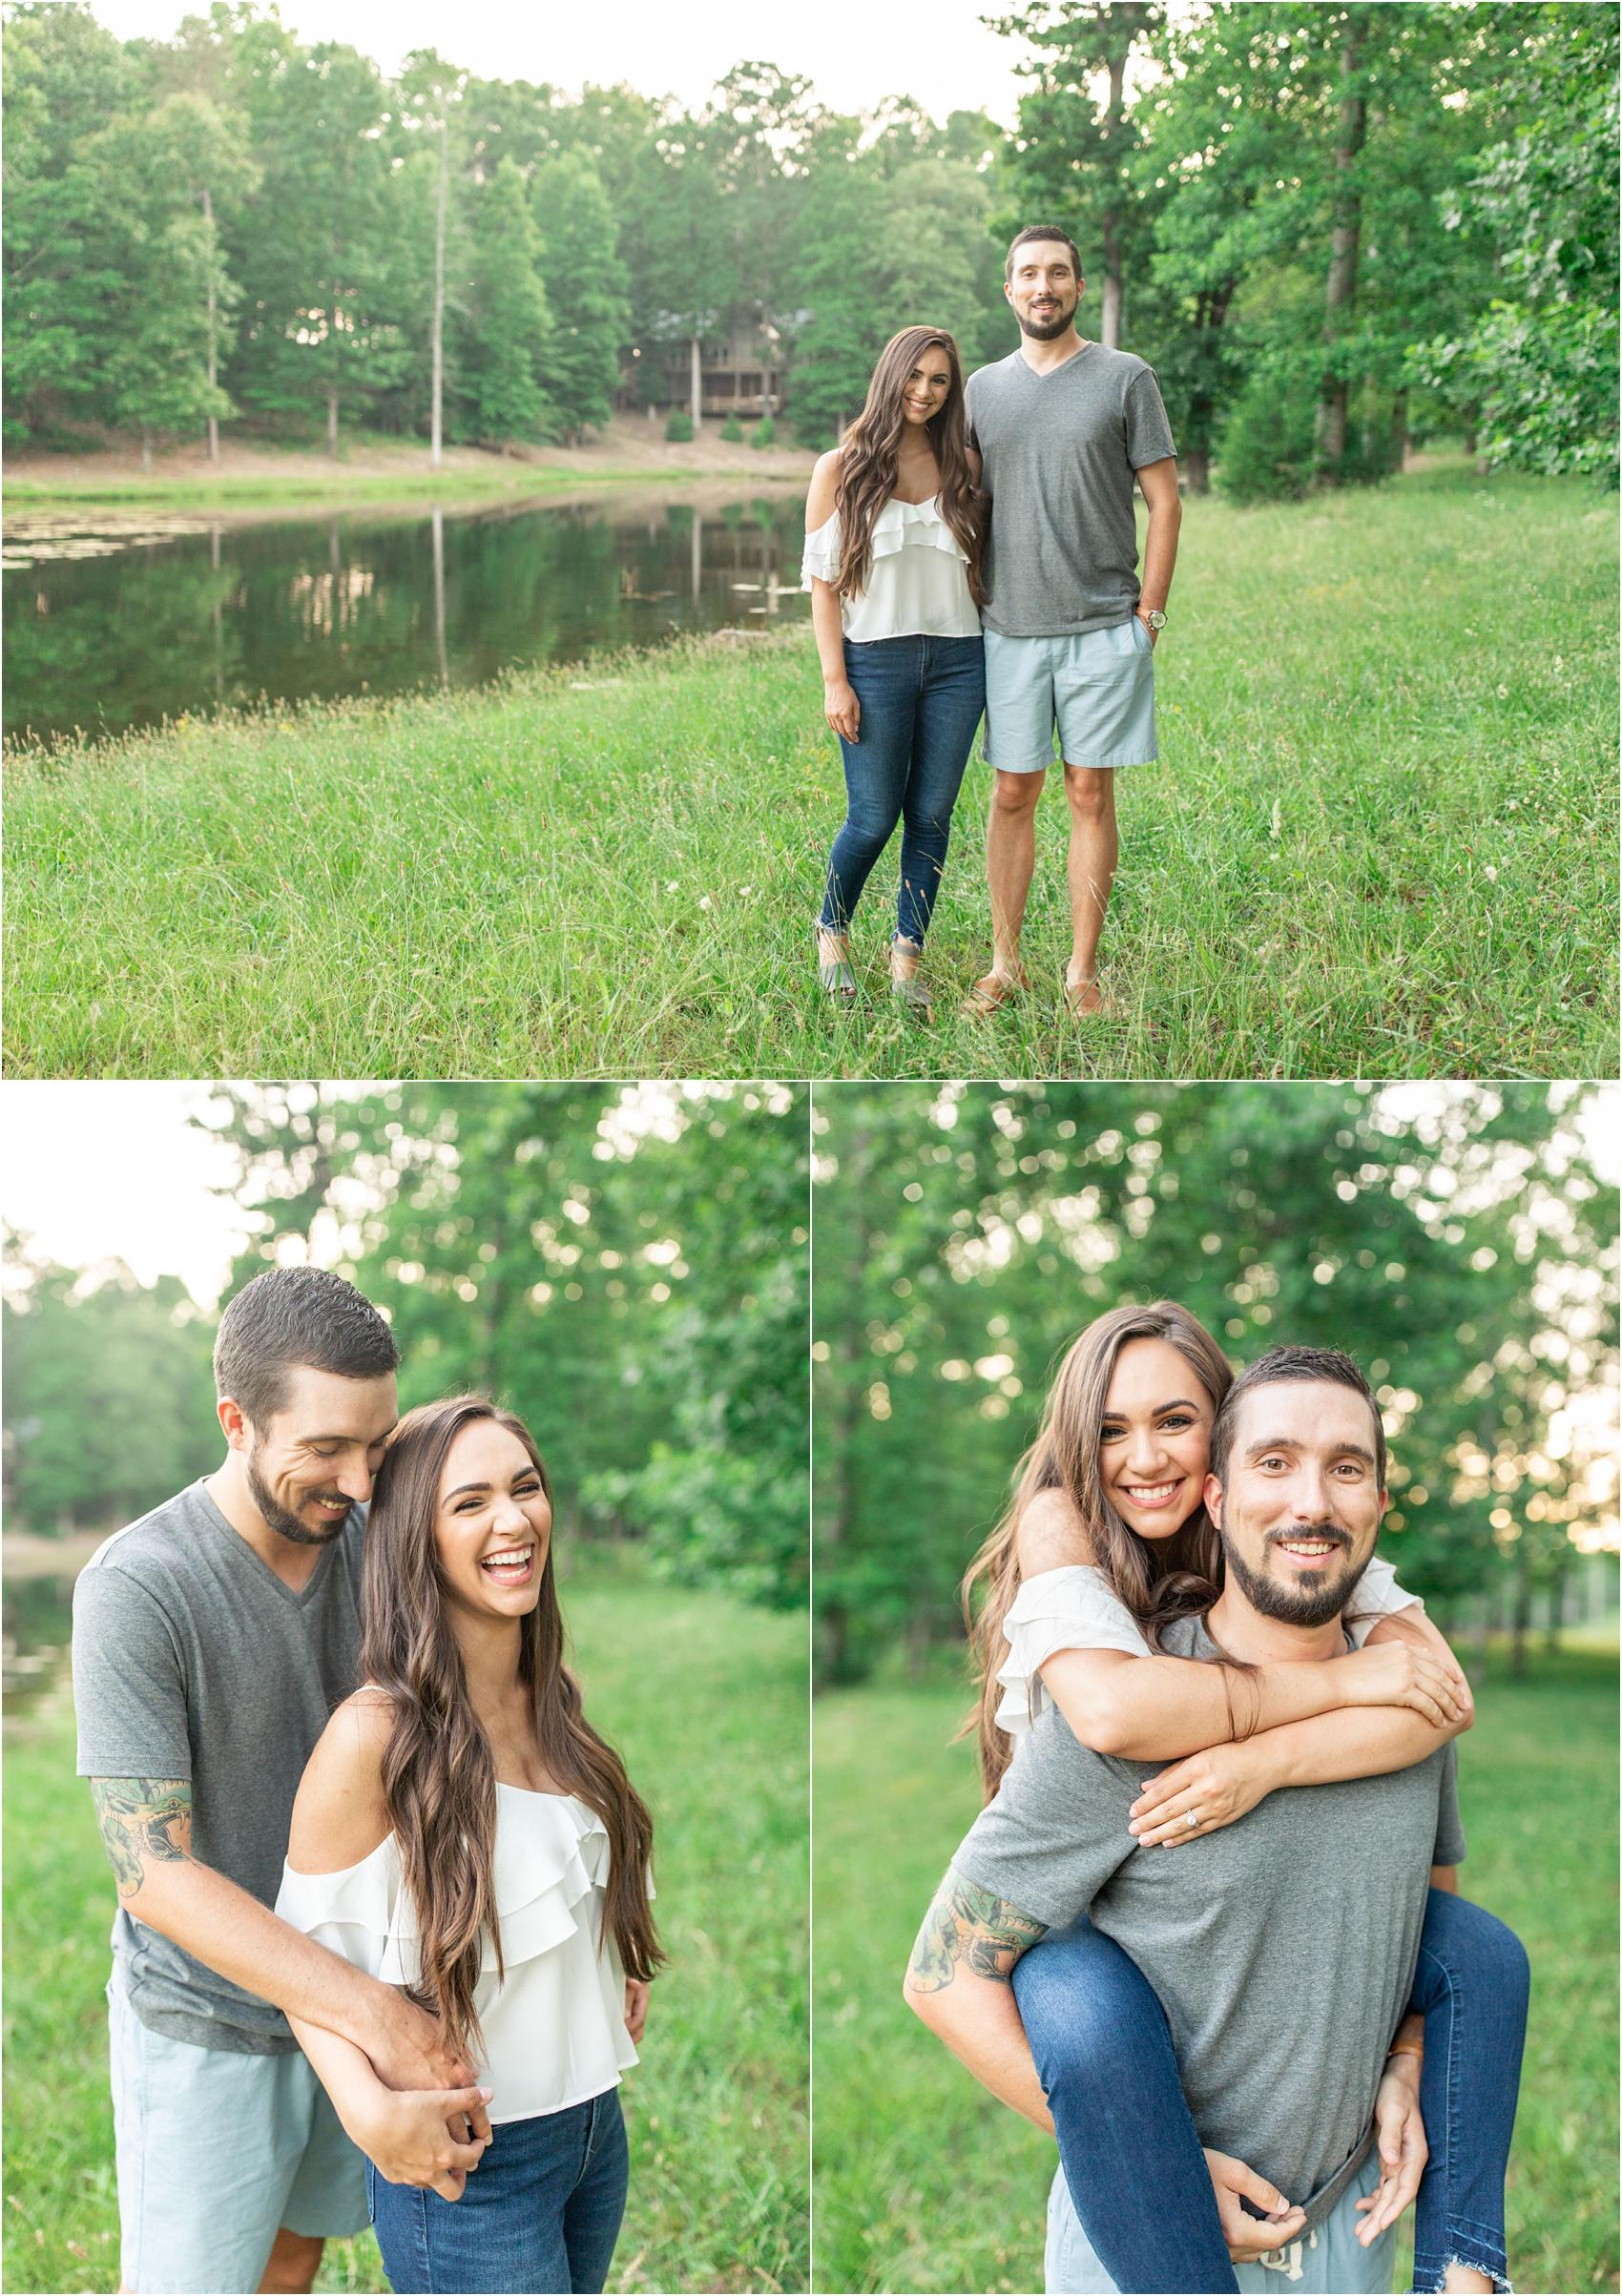 Savannah Eve Photography LLC- Tiffani & Josh Beck @ The Walters Barn- Blog-24.jpg